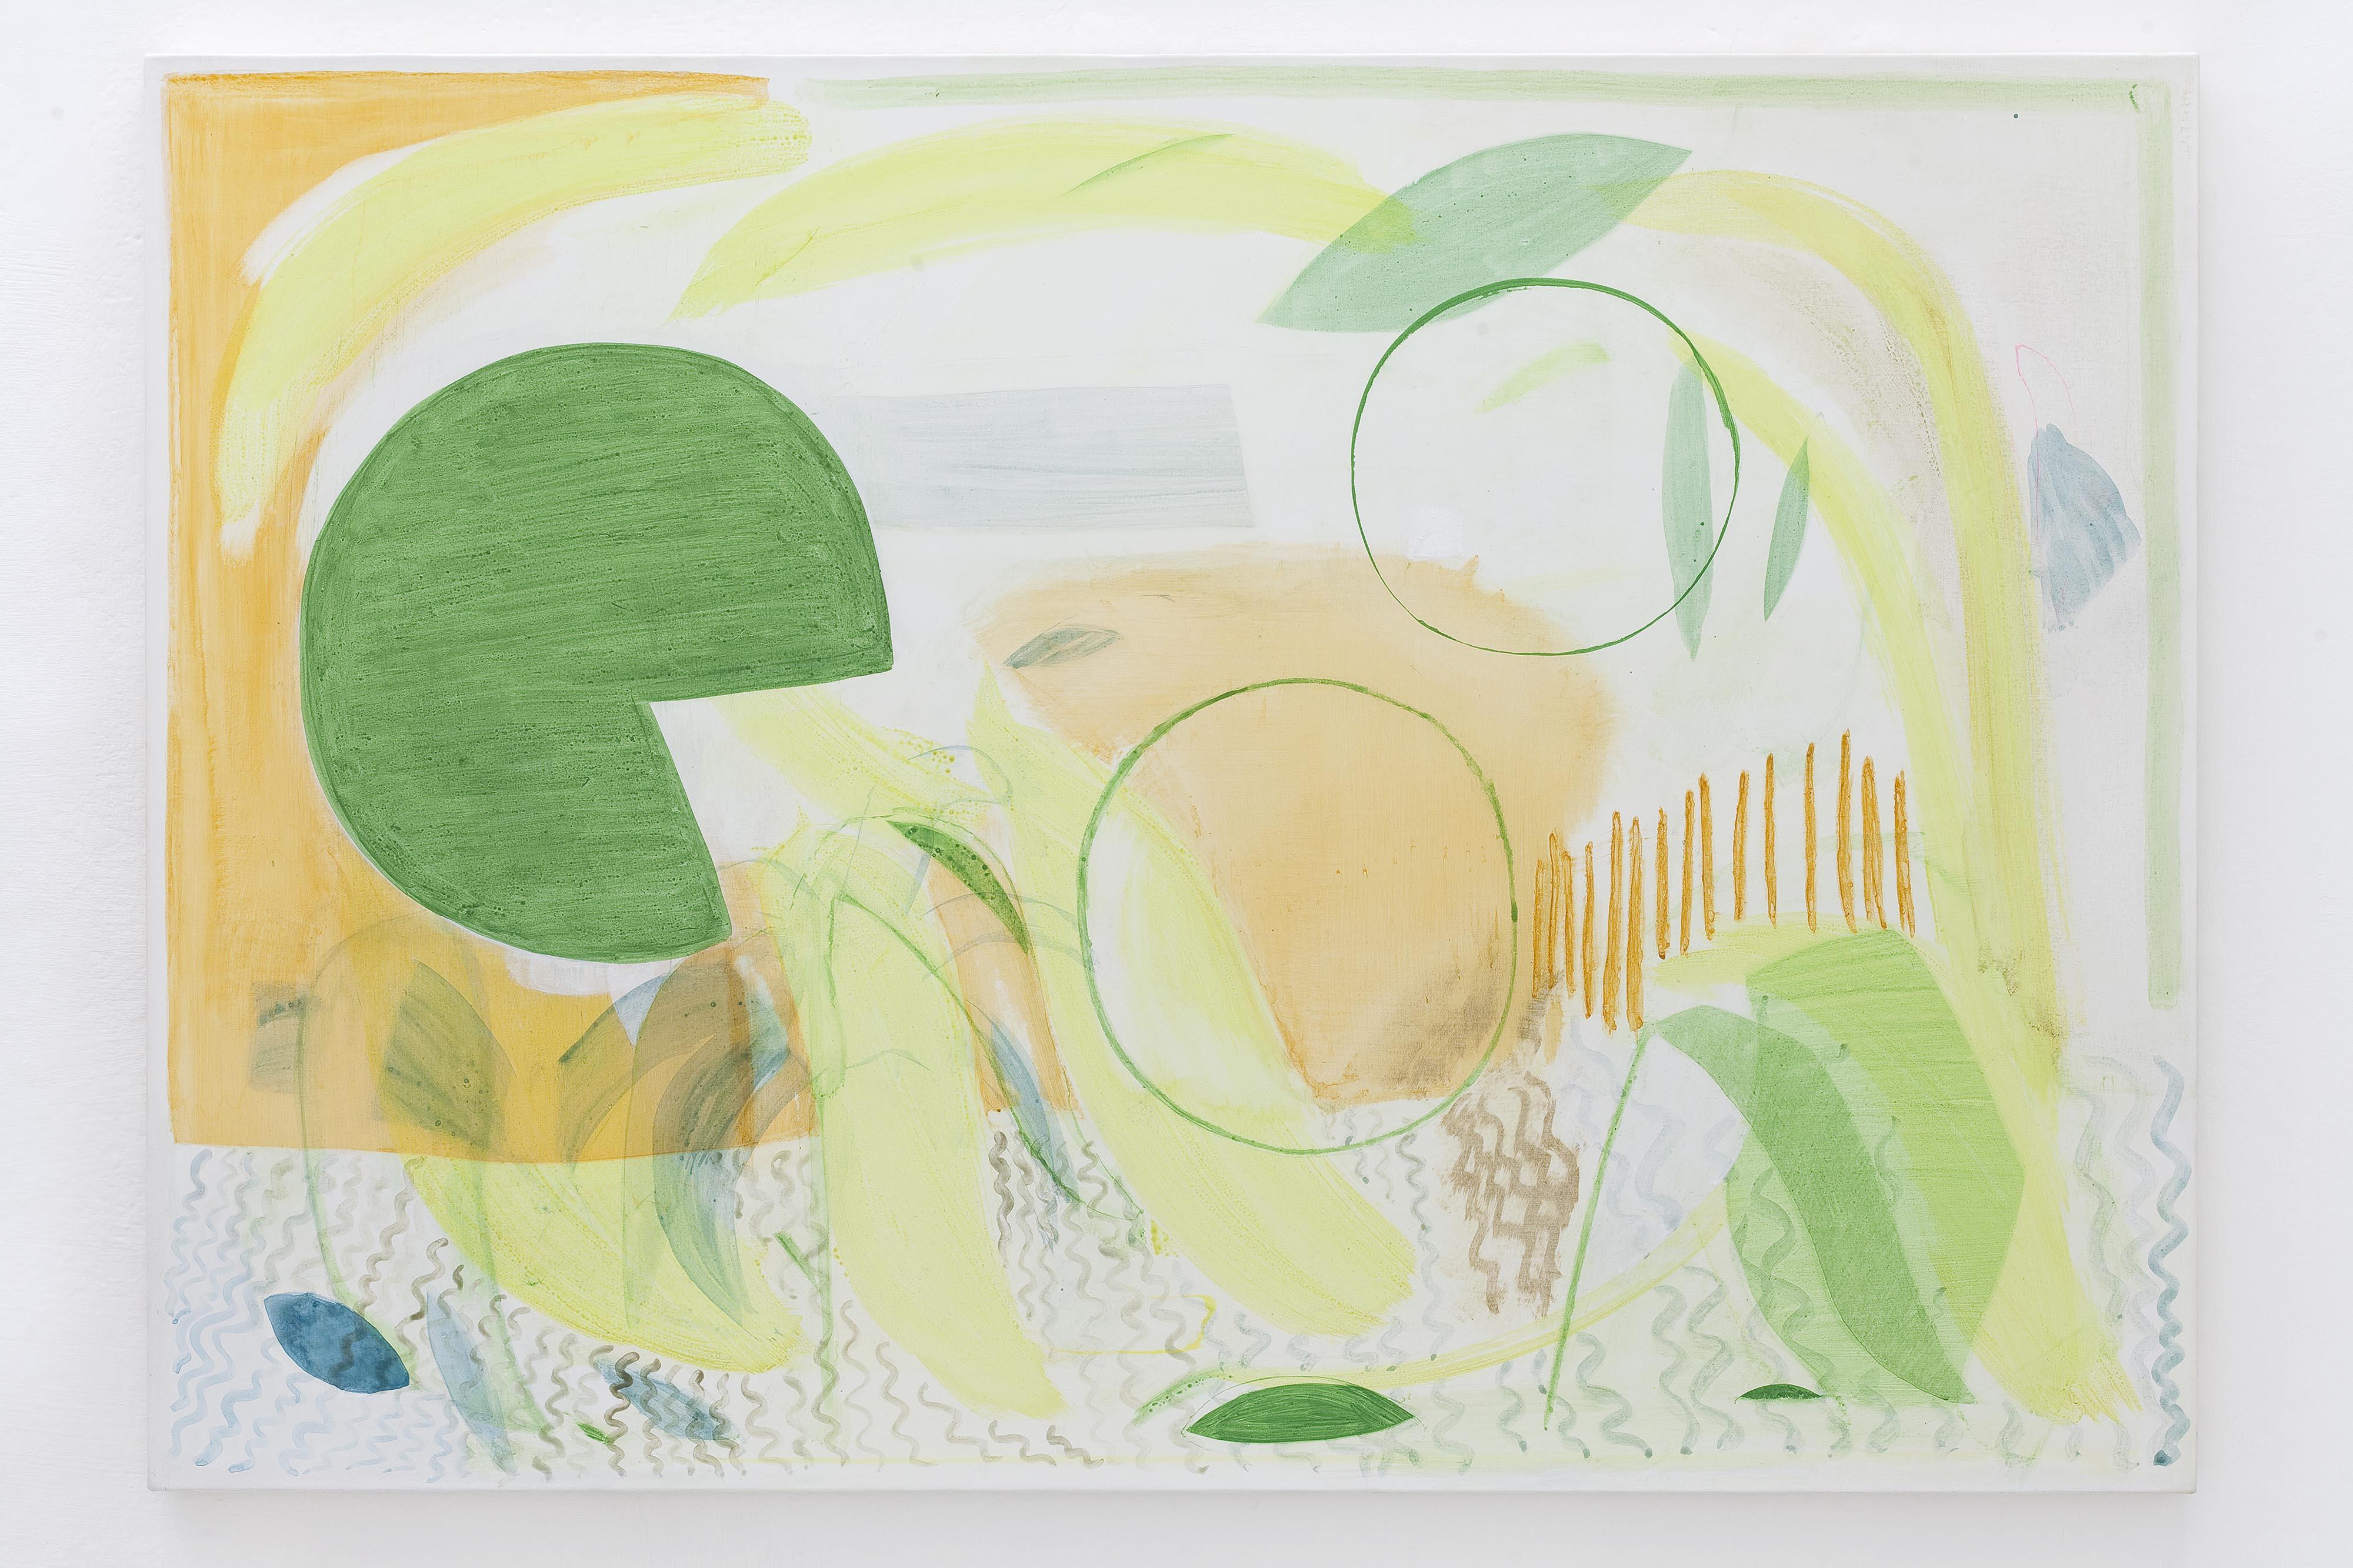 19 - Charlotte Herzig Oo 2016 acrylic on canvas 70x90 cm Courtesy Studiolo Milan - photo Filippo Armellin copia